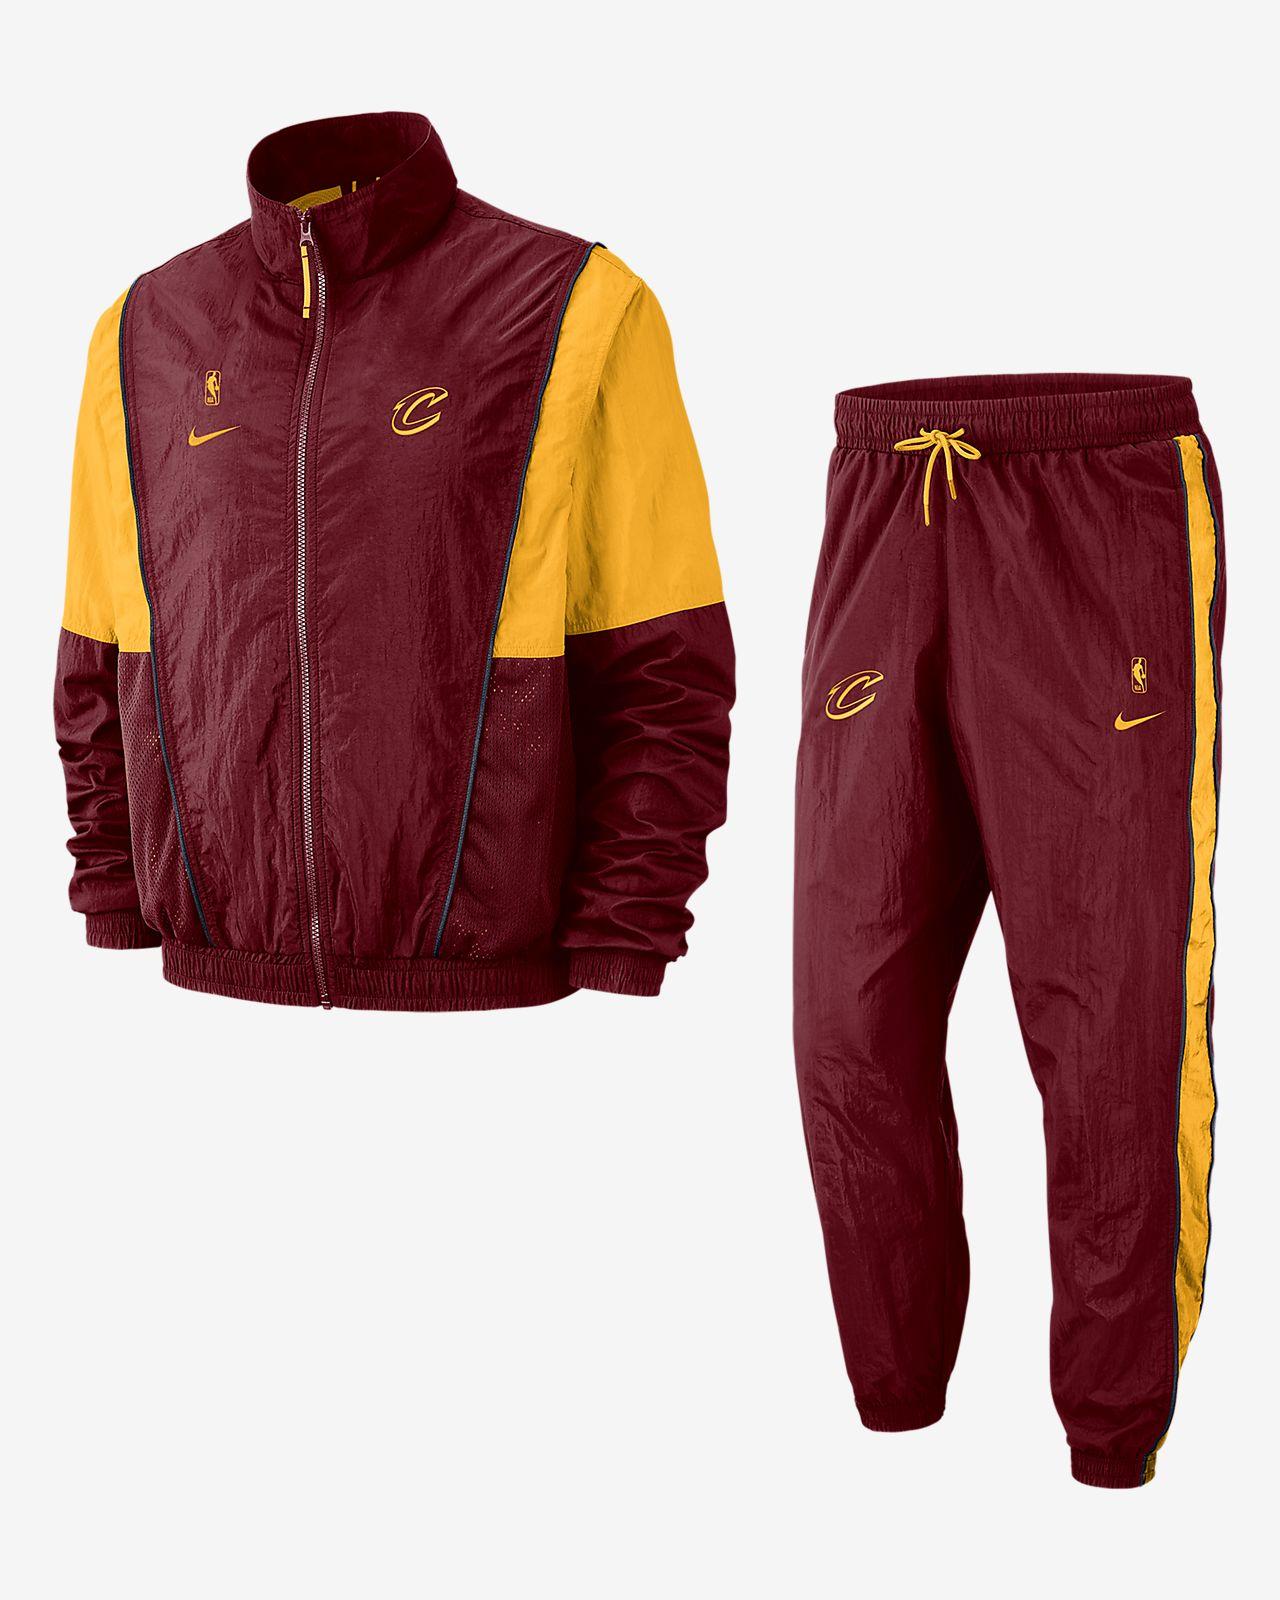 Cleveland Cavaliers Nike Men's NBA Tracksuit